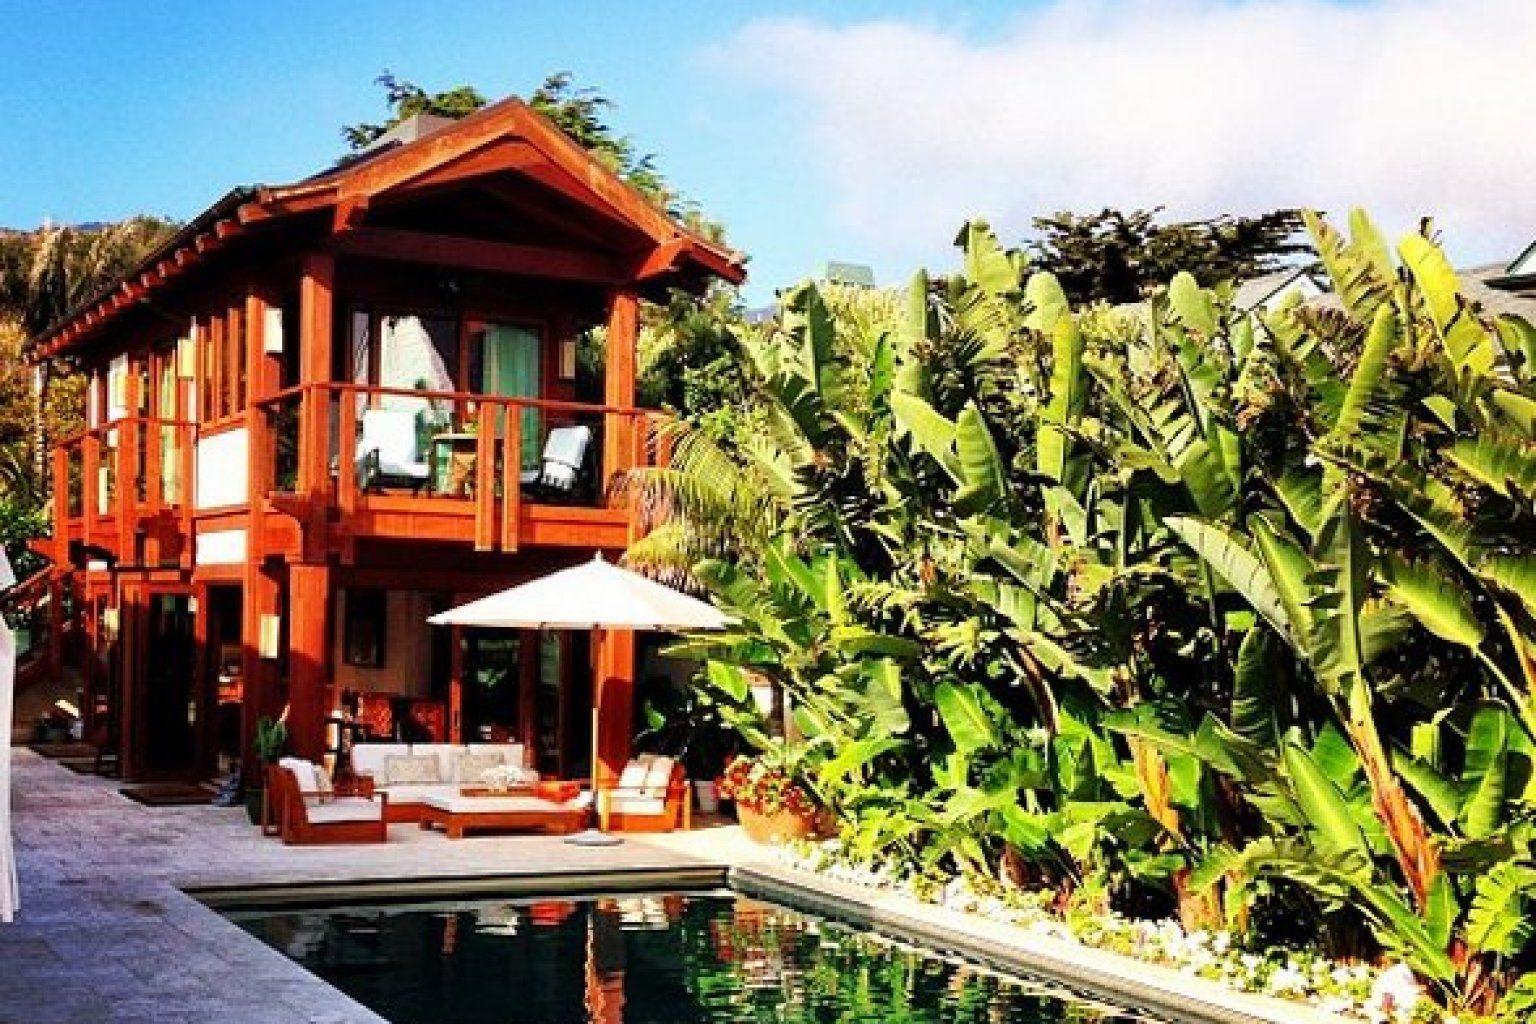 Photo The Real James Bond Lives Here Malibu Homes Celebrity Houses House Styles